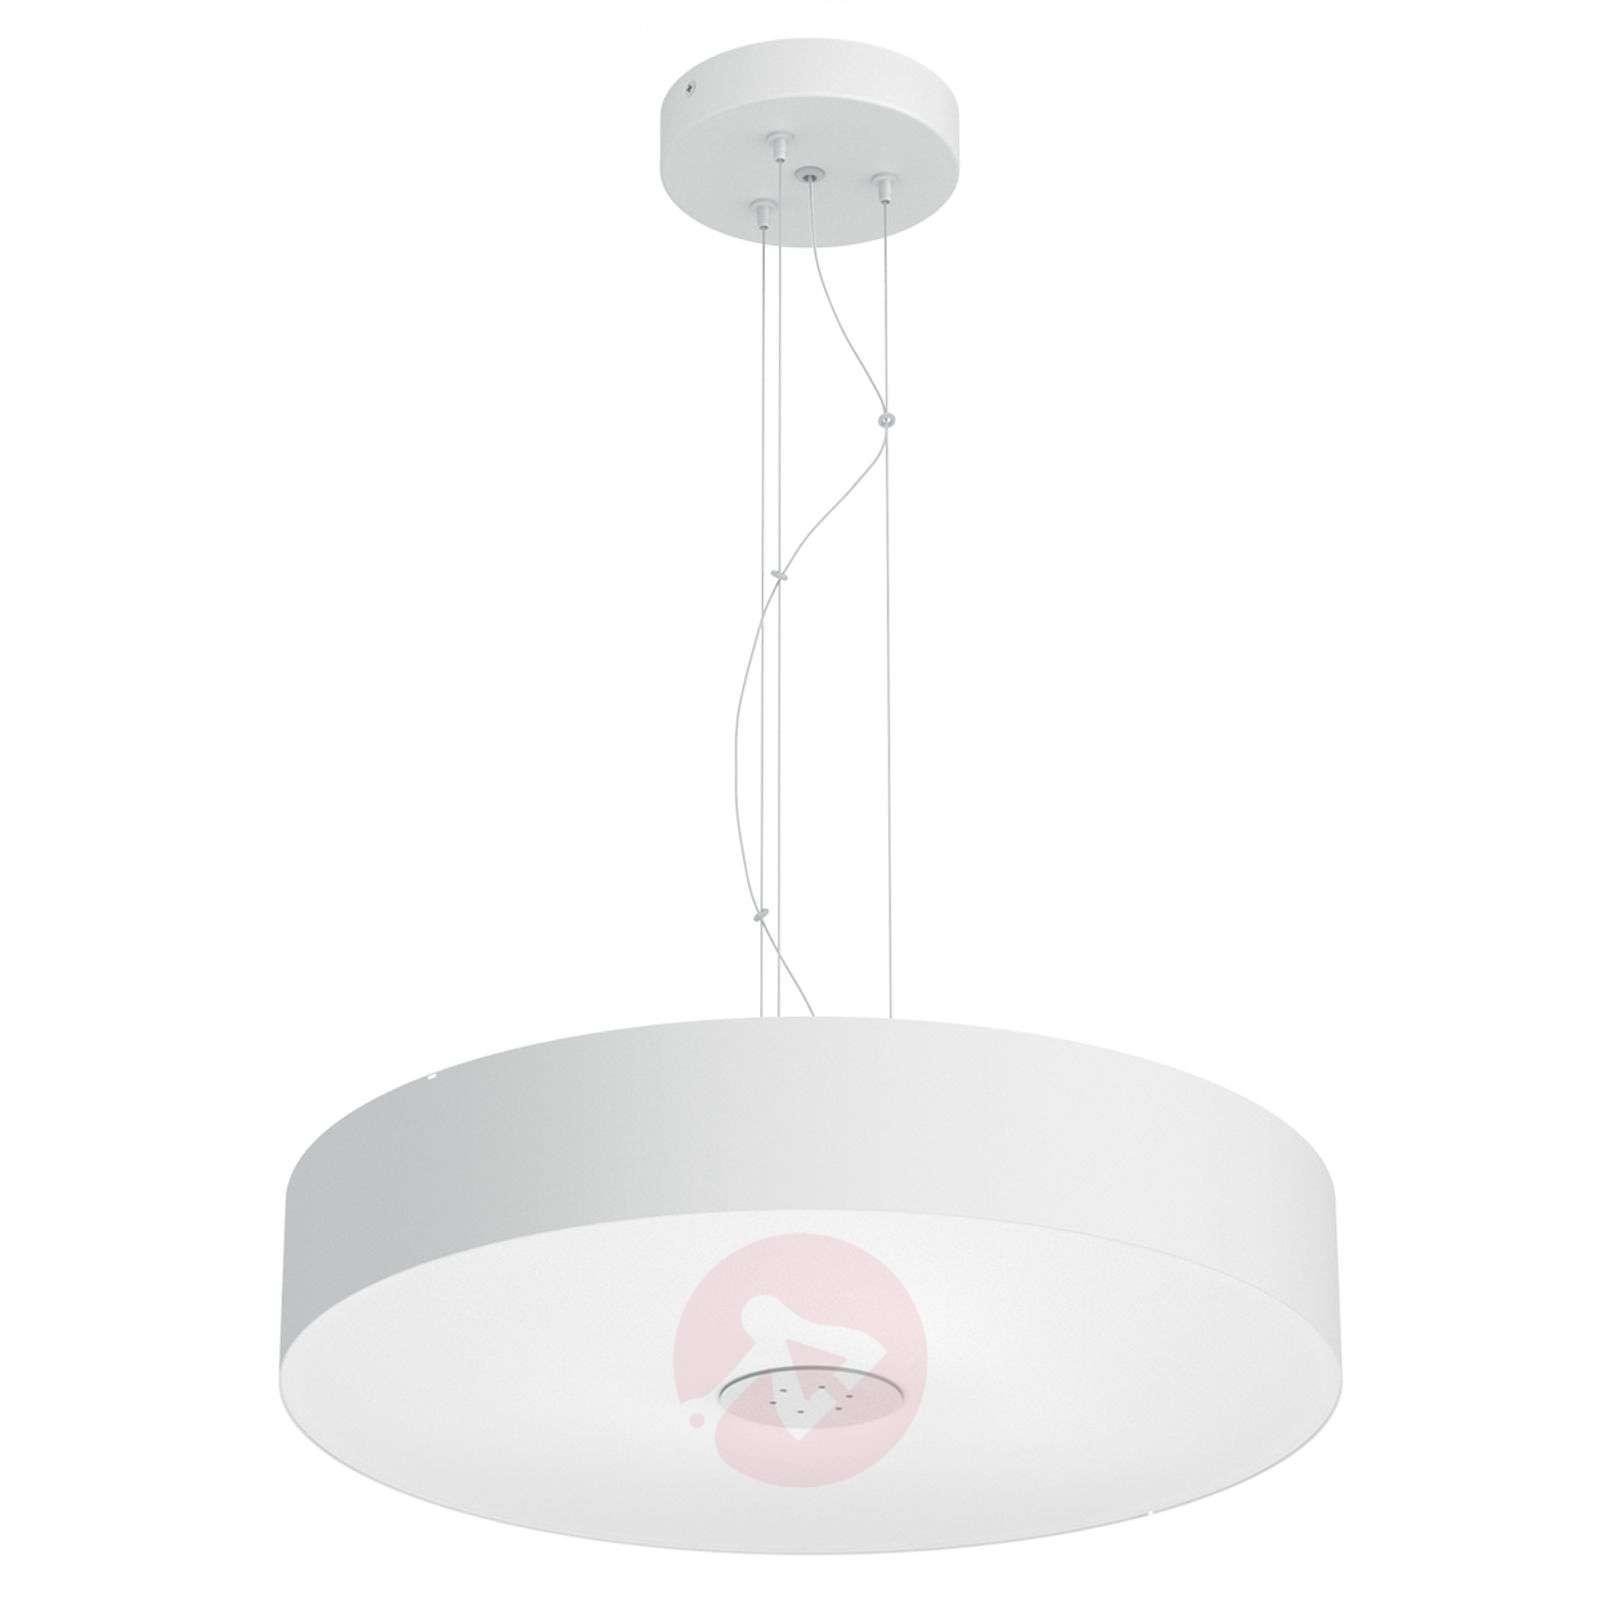 Philips Hue White Ambiance Fair pendant, white-7531875-01